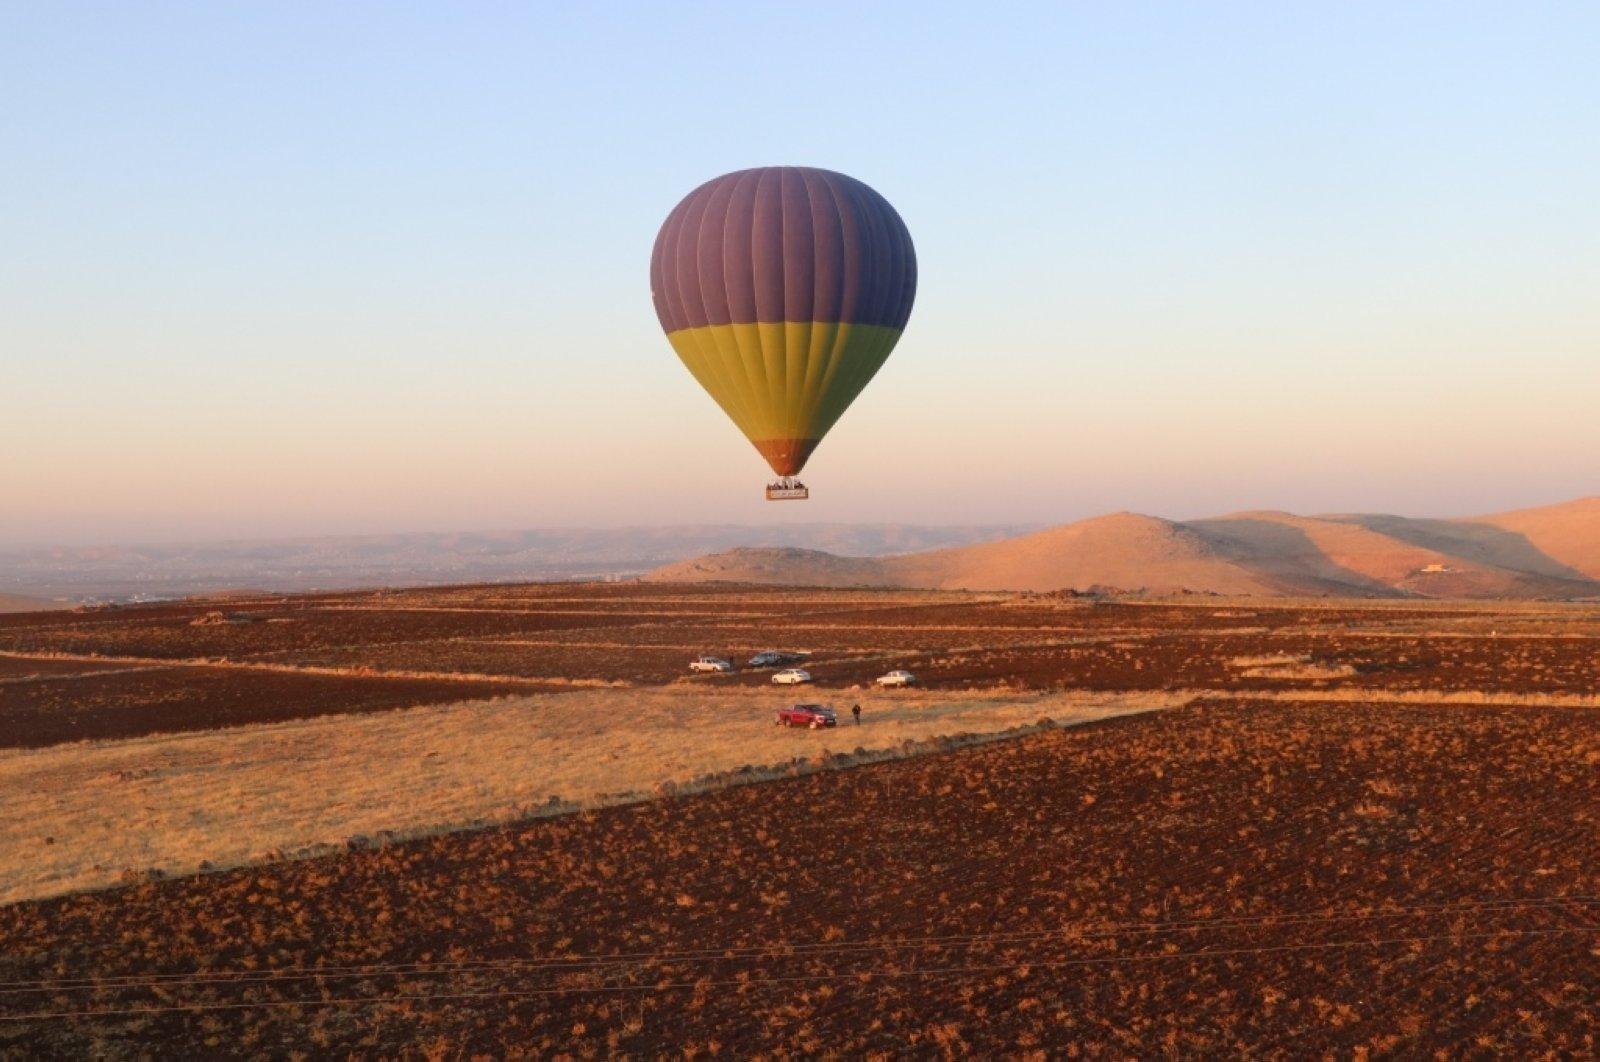 Hot air balloon rides have officially commenced in Göbeklitepe, Şanlıurfa in southeastern Turkey. (AA Photo)